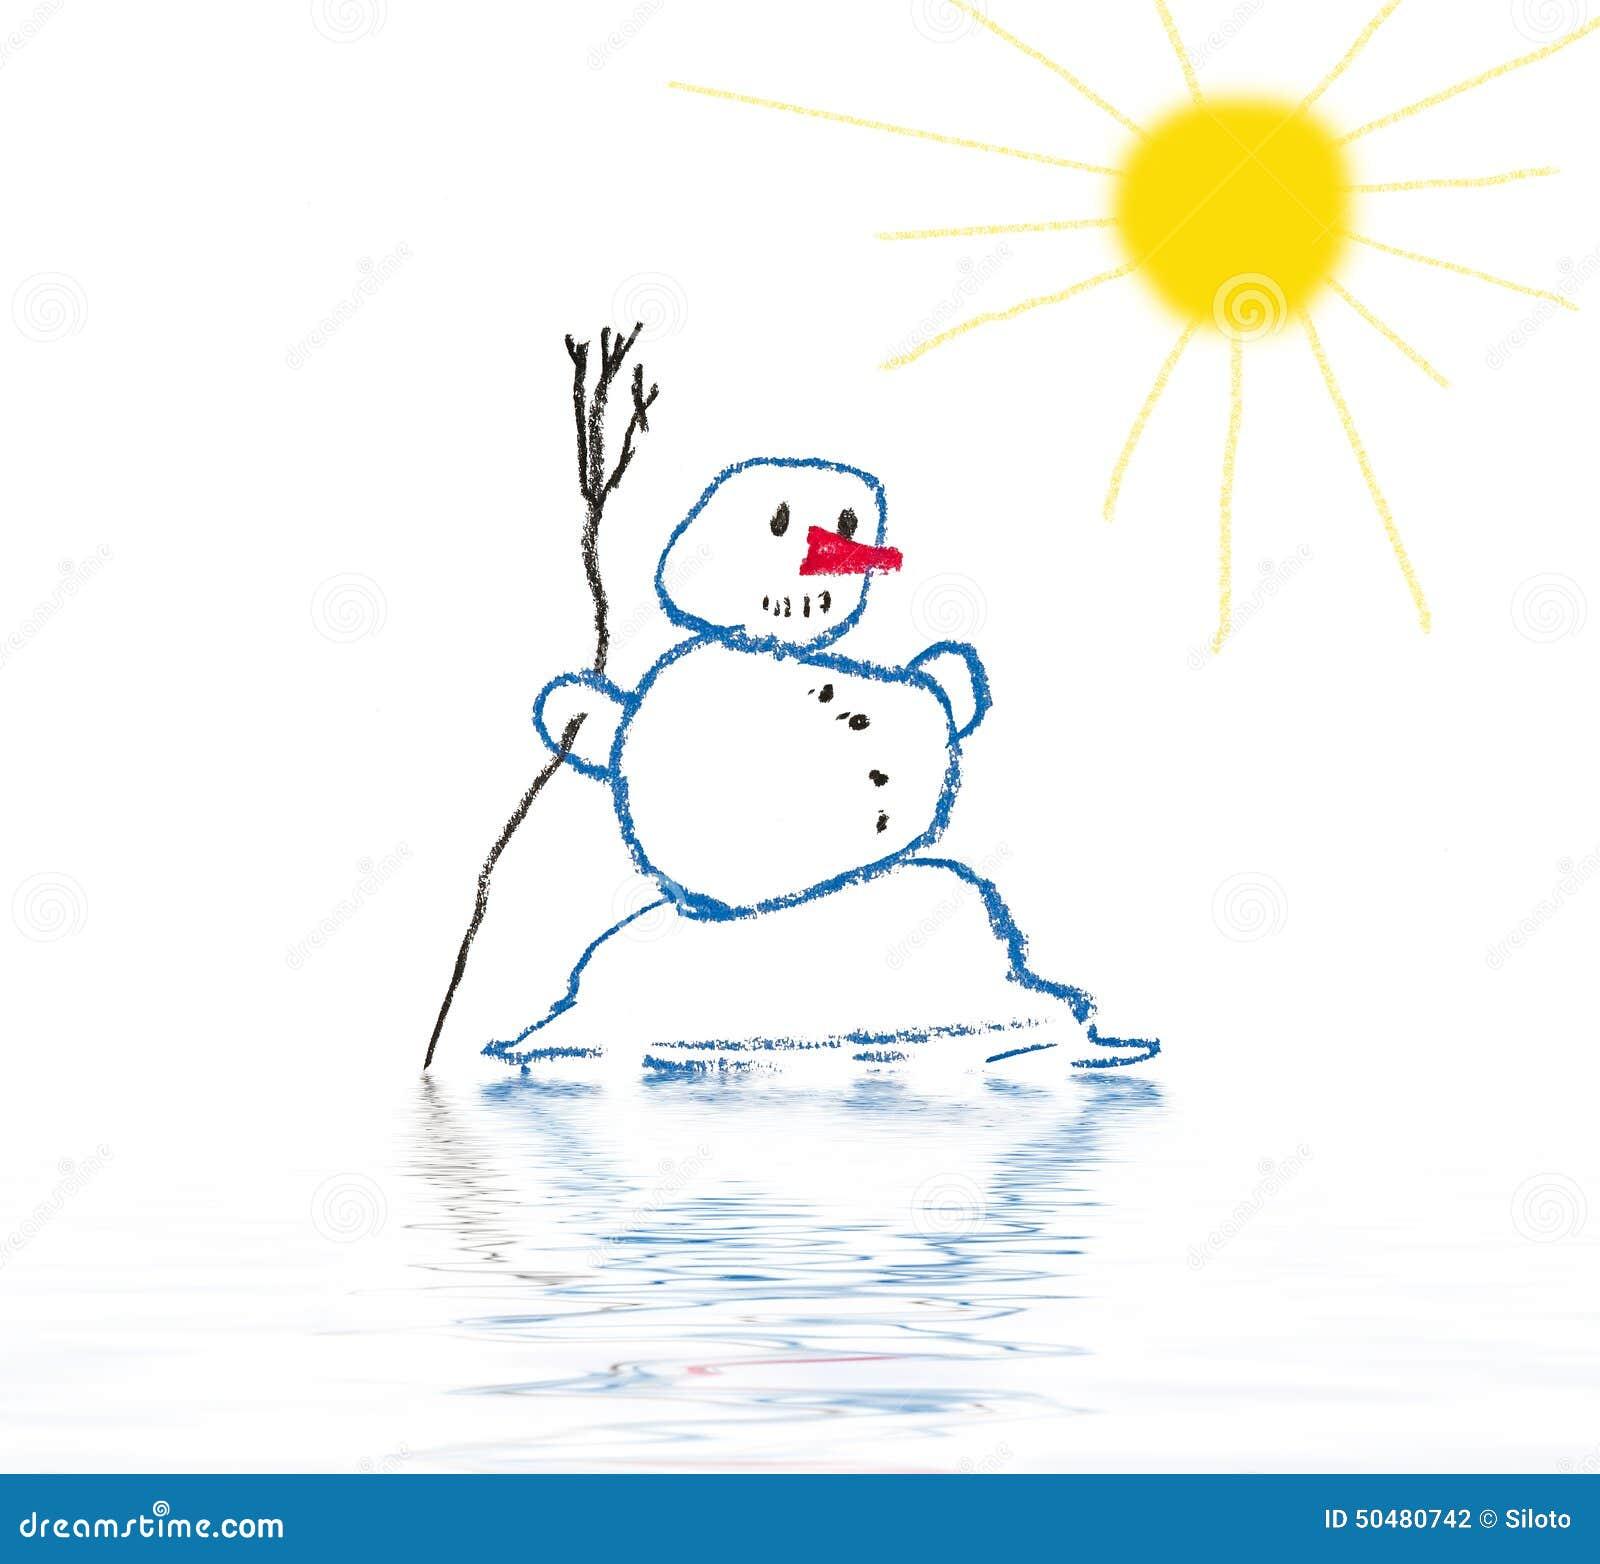 Melting Snowman Stock Illustrations – 107 Melting Snowman Stock ... for Melting Snowman Clipart  165jwn